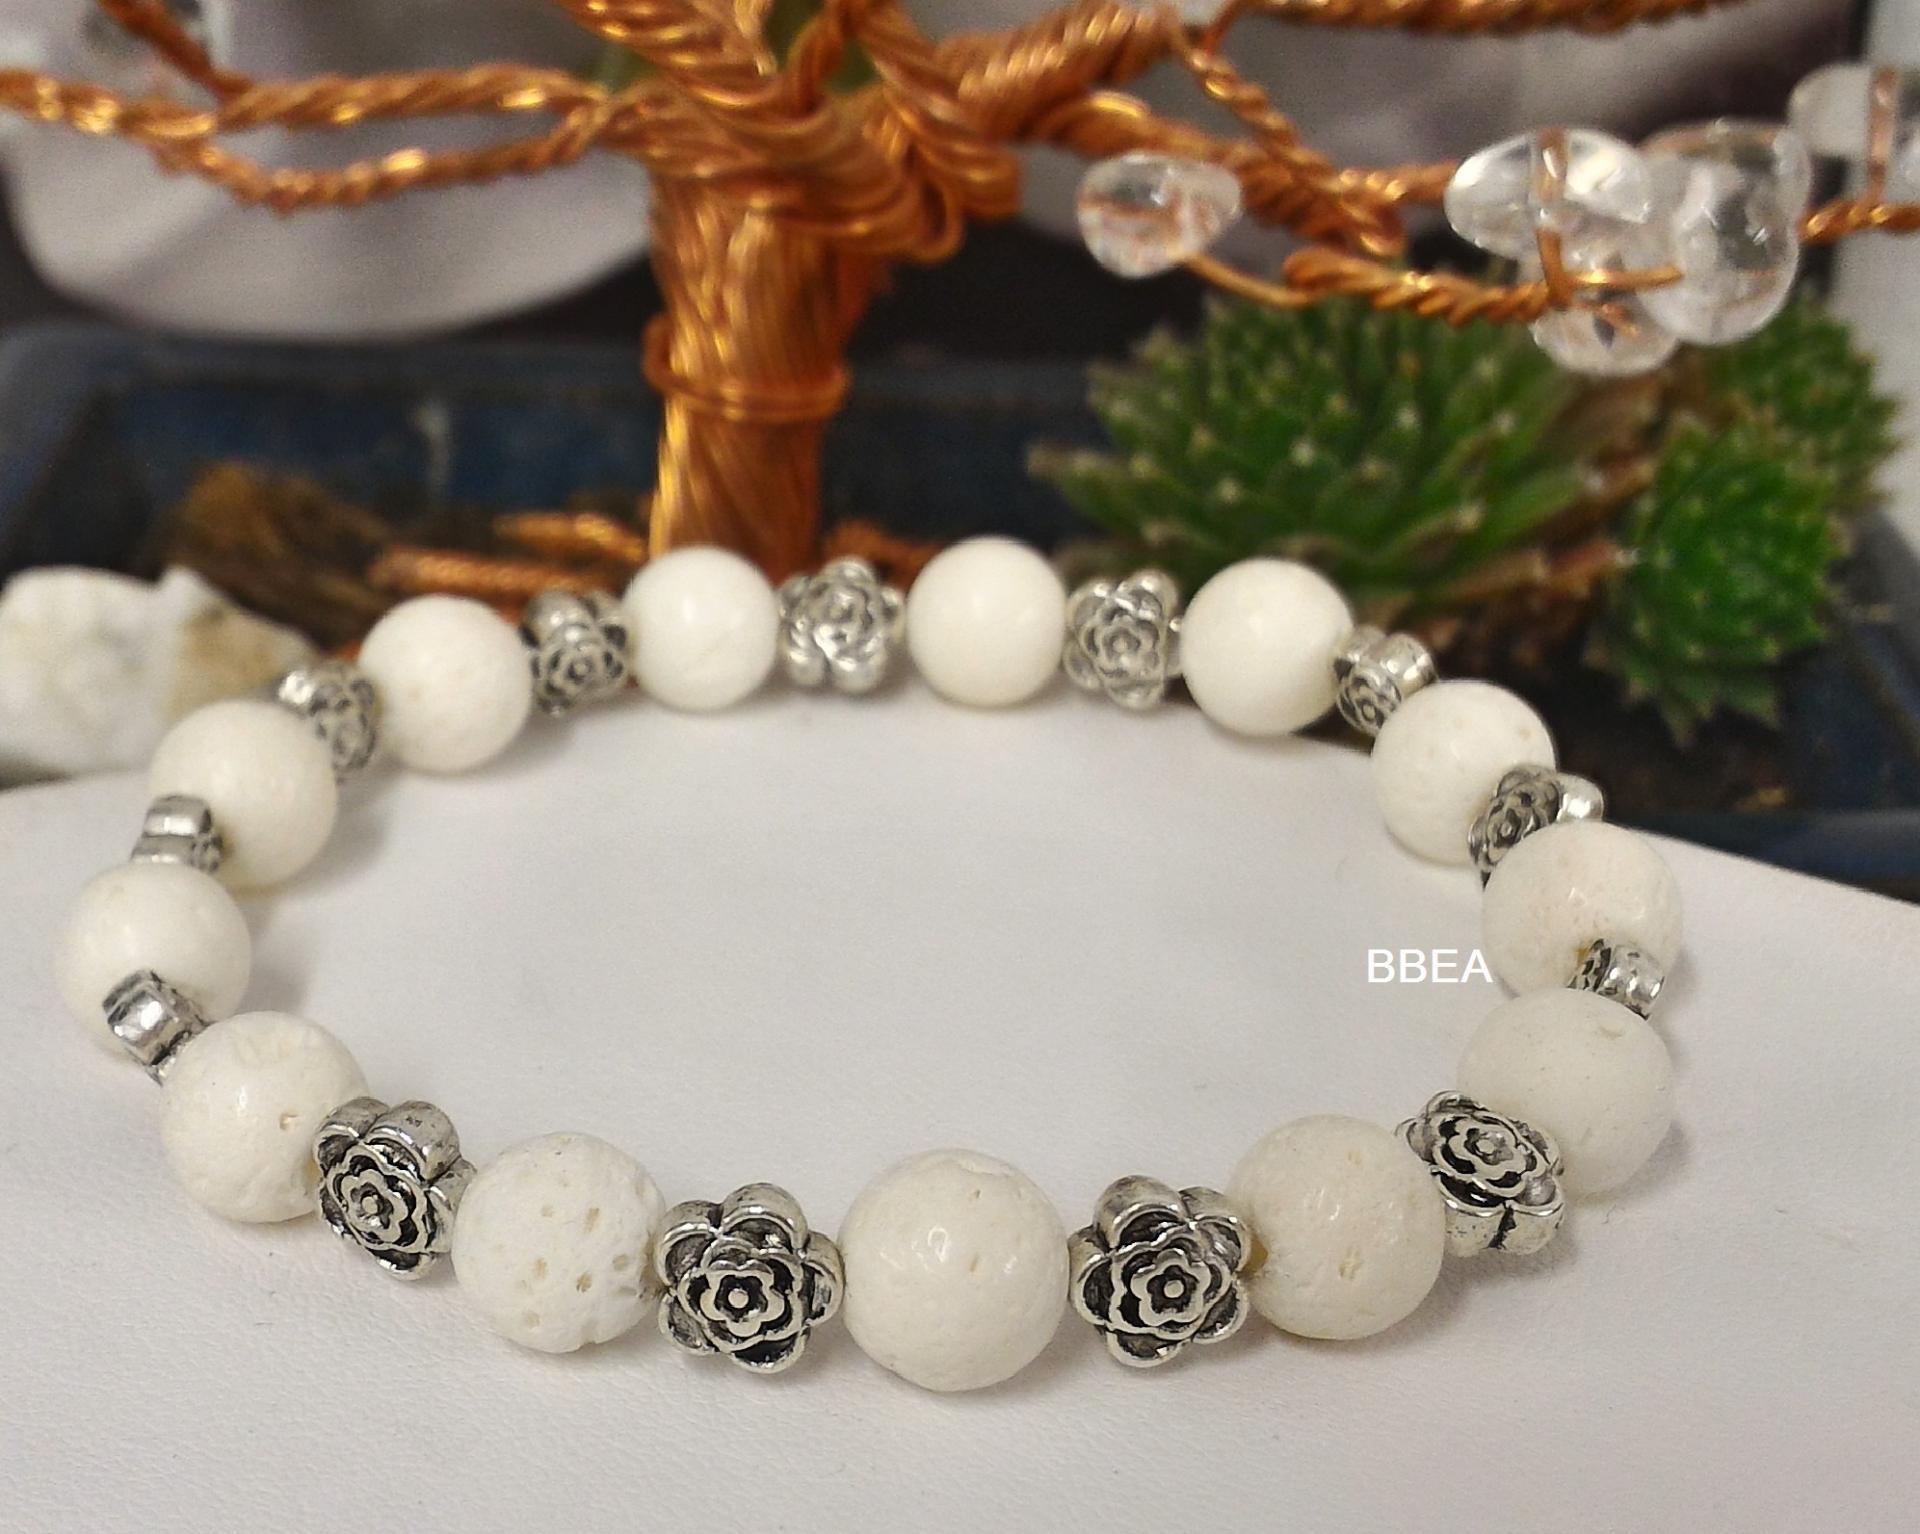 Bracelet corail 2 4